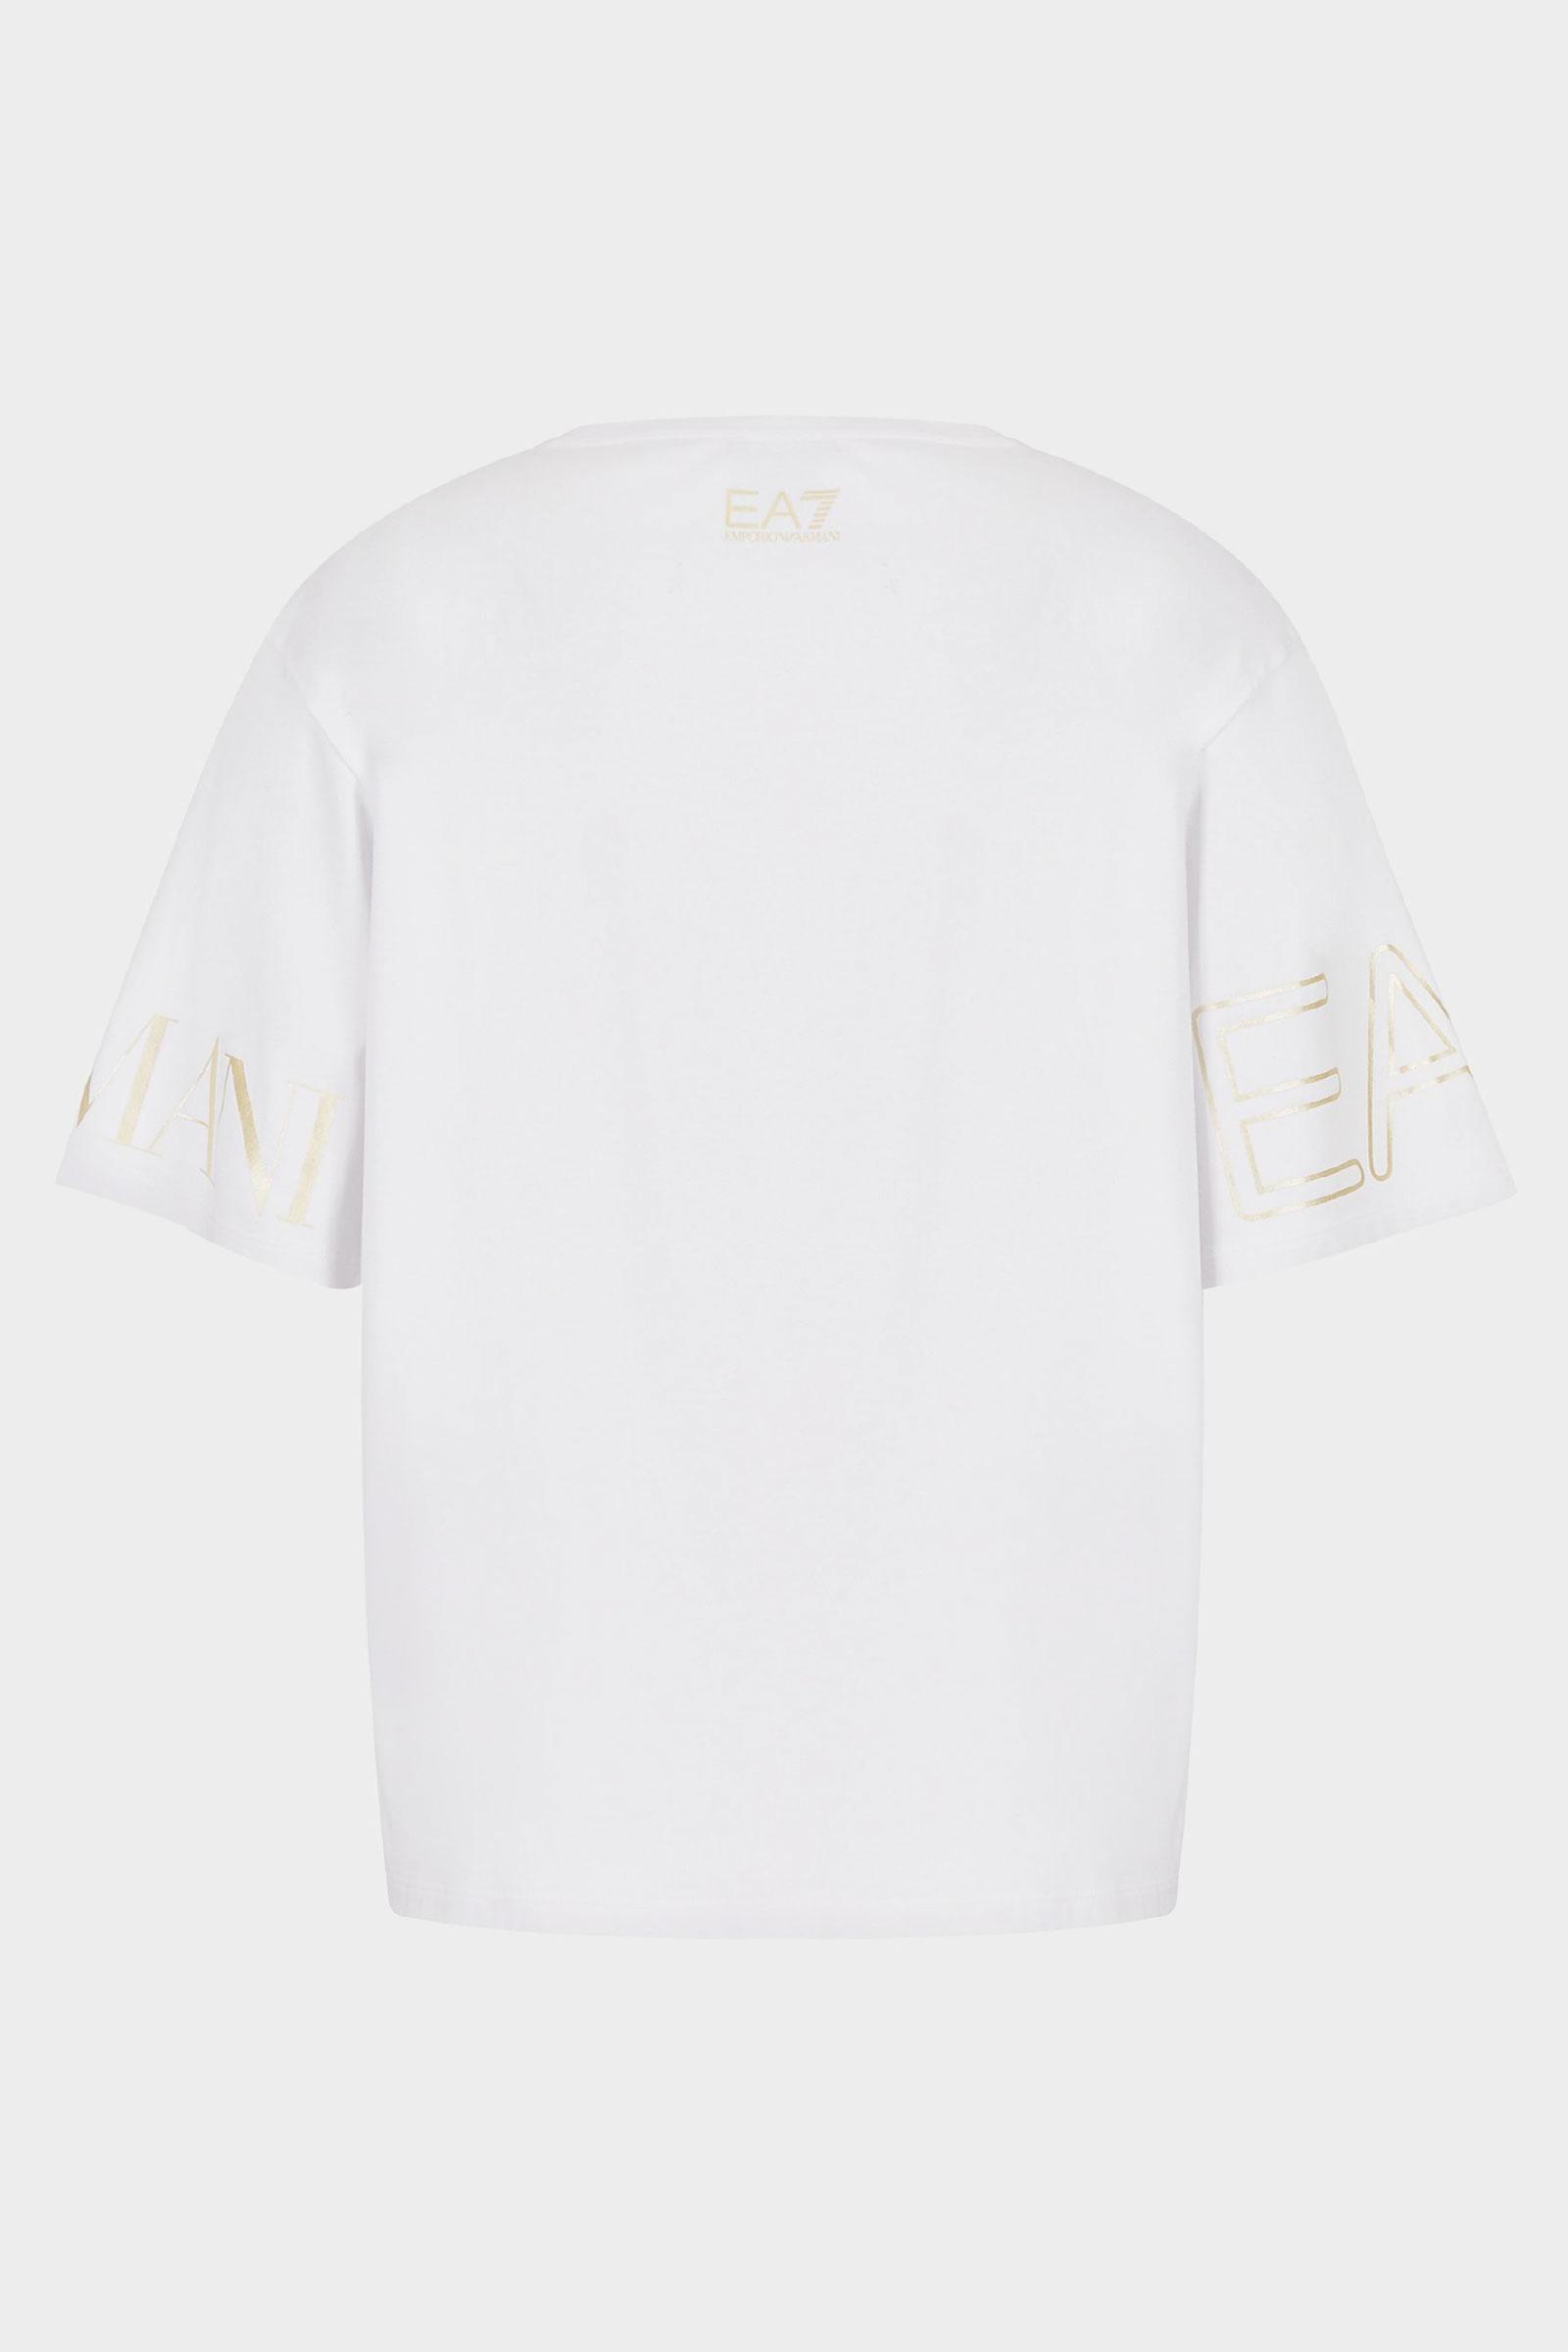 ARMANI EA7 T-Shirt Donna ARMANI EA7 | T-Shirt | 3KTT18 TJ29Z0101